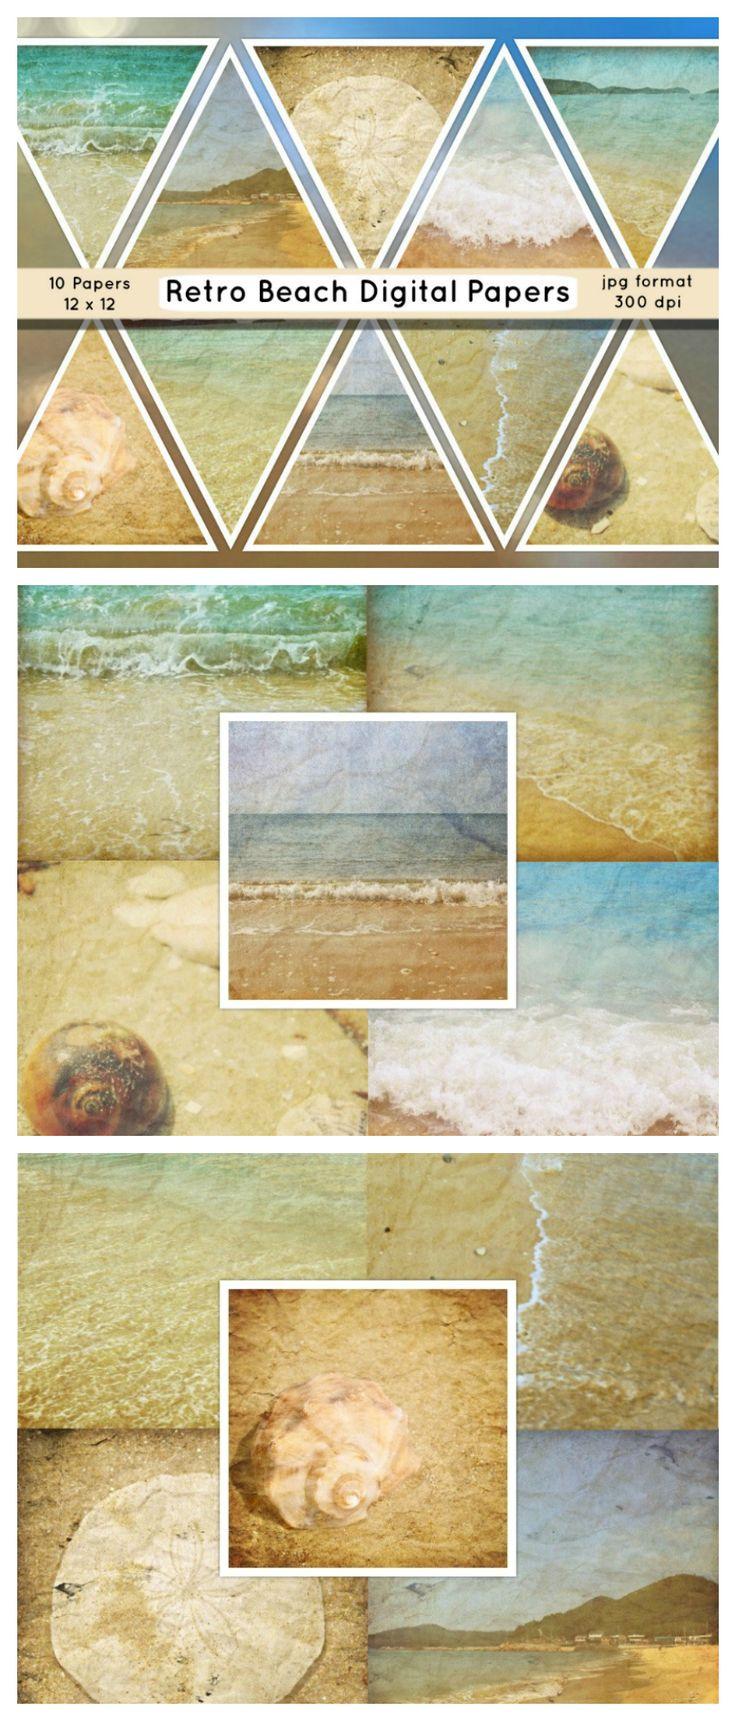 Scrapbook paper england - Beach Digital Paper Beach Photo Backdrops Paper Beach Texture Digital Paper Retro Beach Paper Beach Scrapbooking Papers Commercial